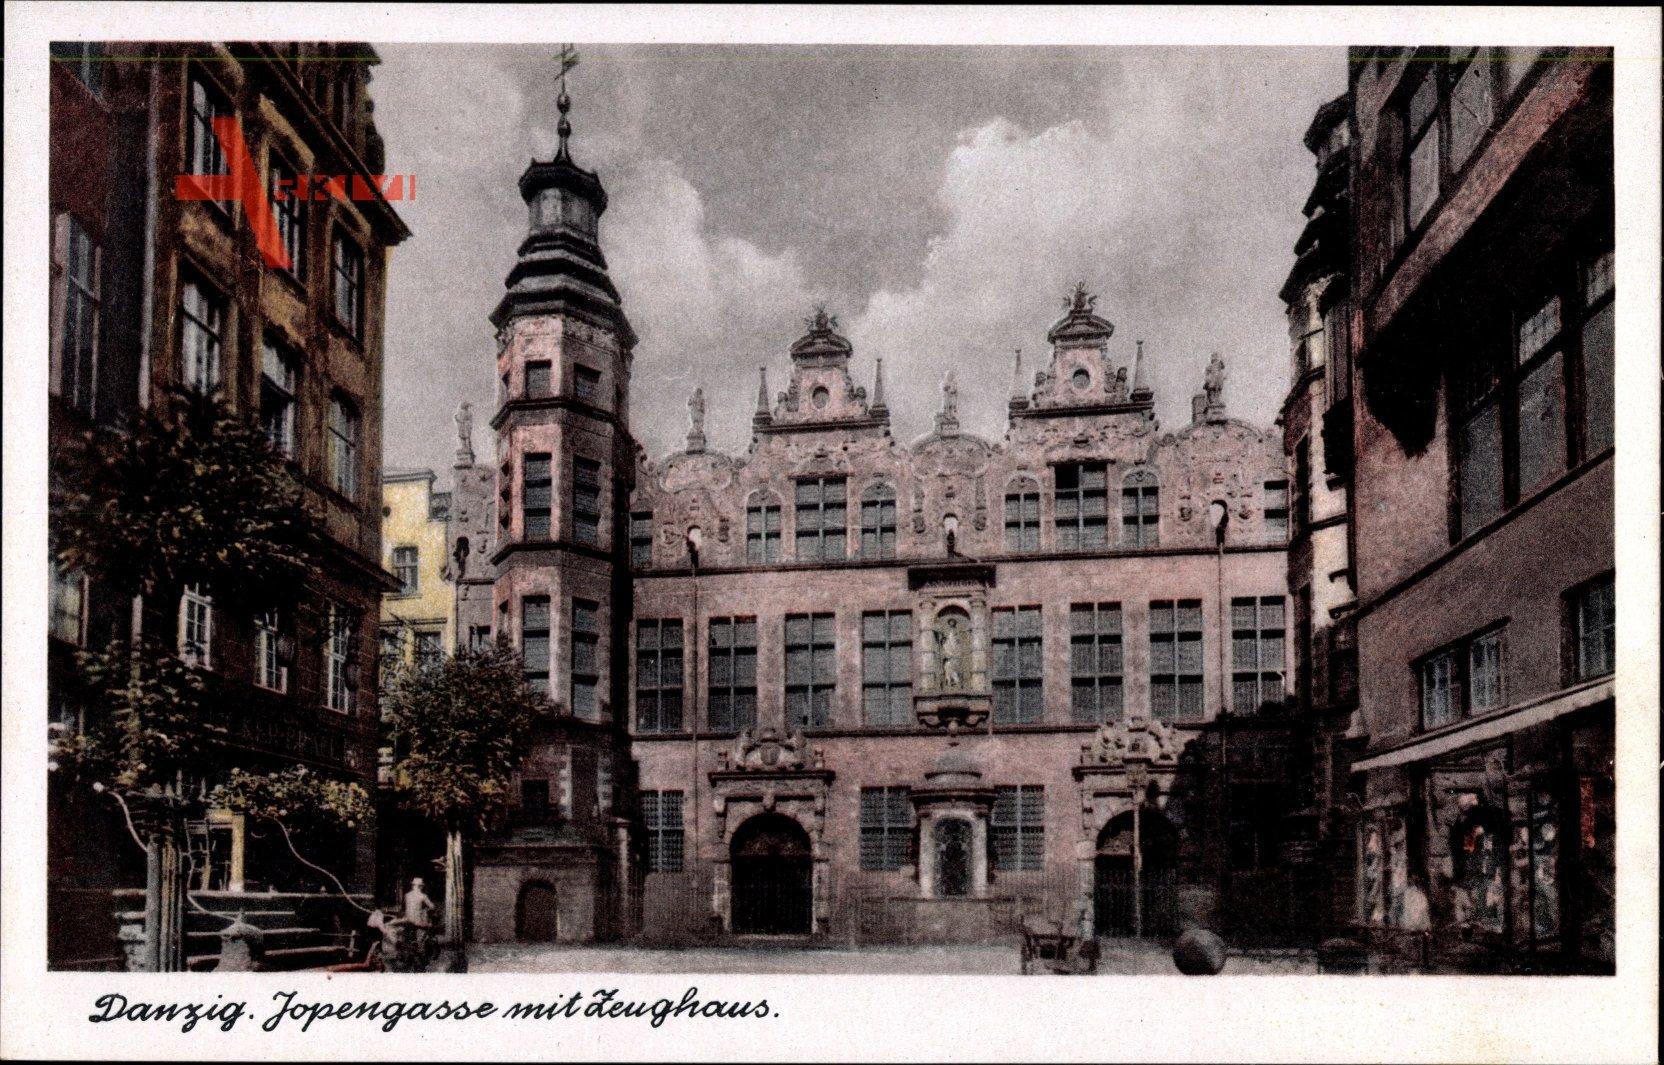 Gdańsk Danzig, Blick in die Jopengasse mit Zeughaus, Fassade, Tor